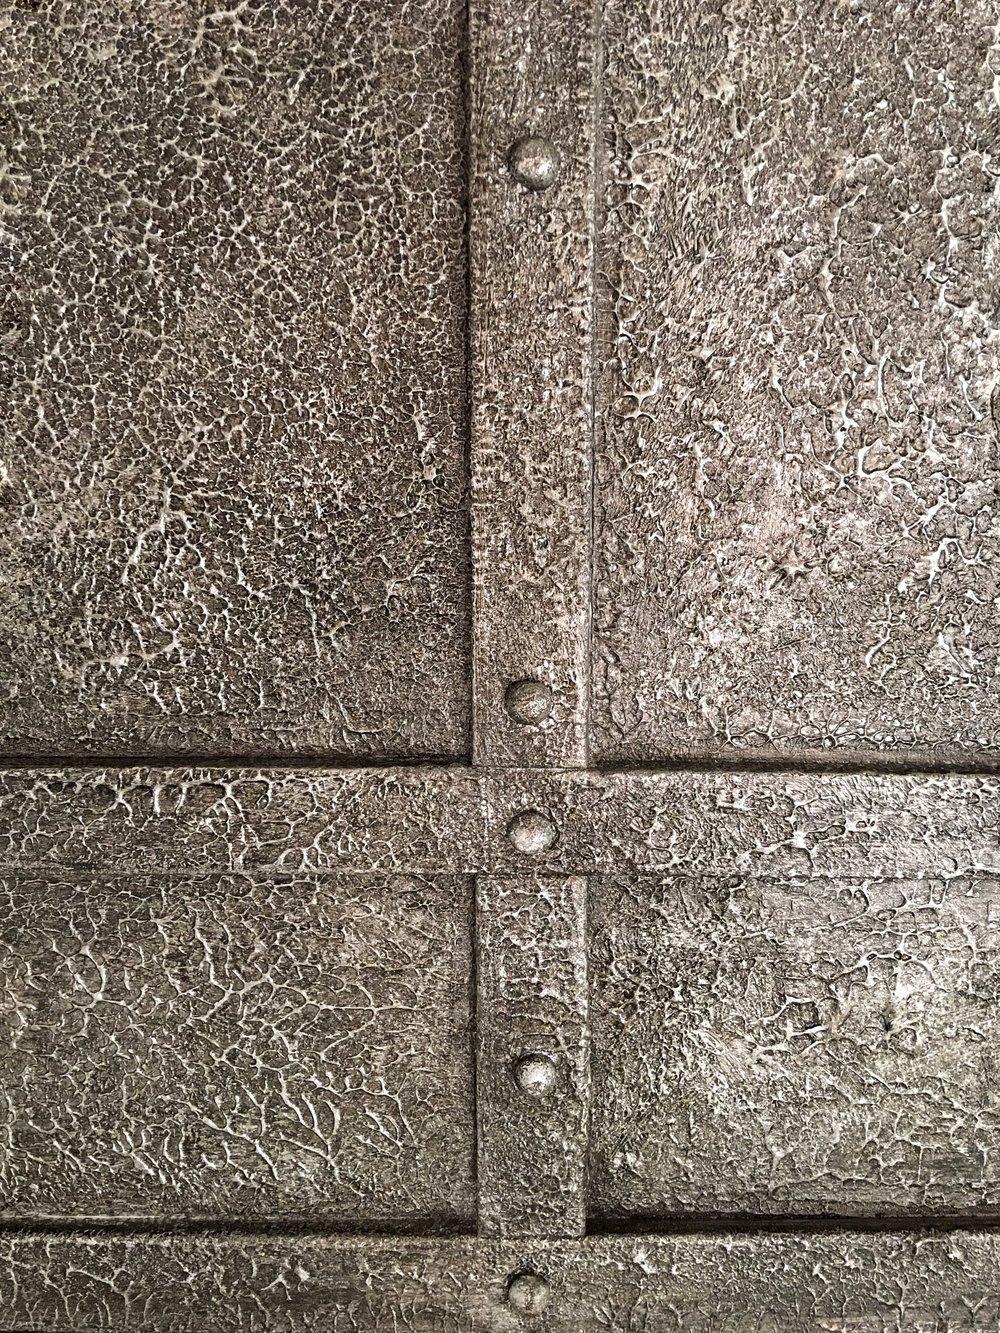 Venetian Plaster Hammered Metal